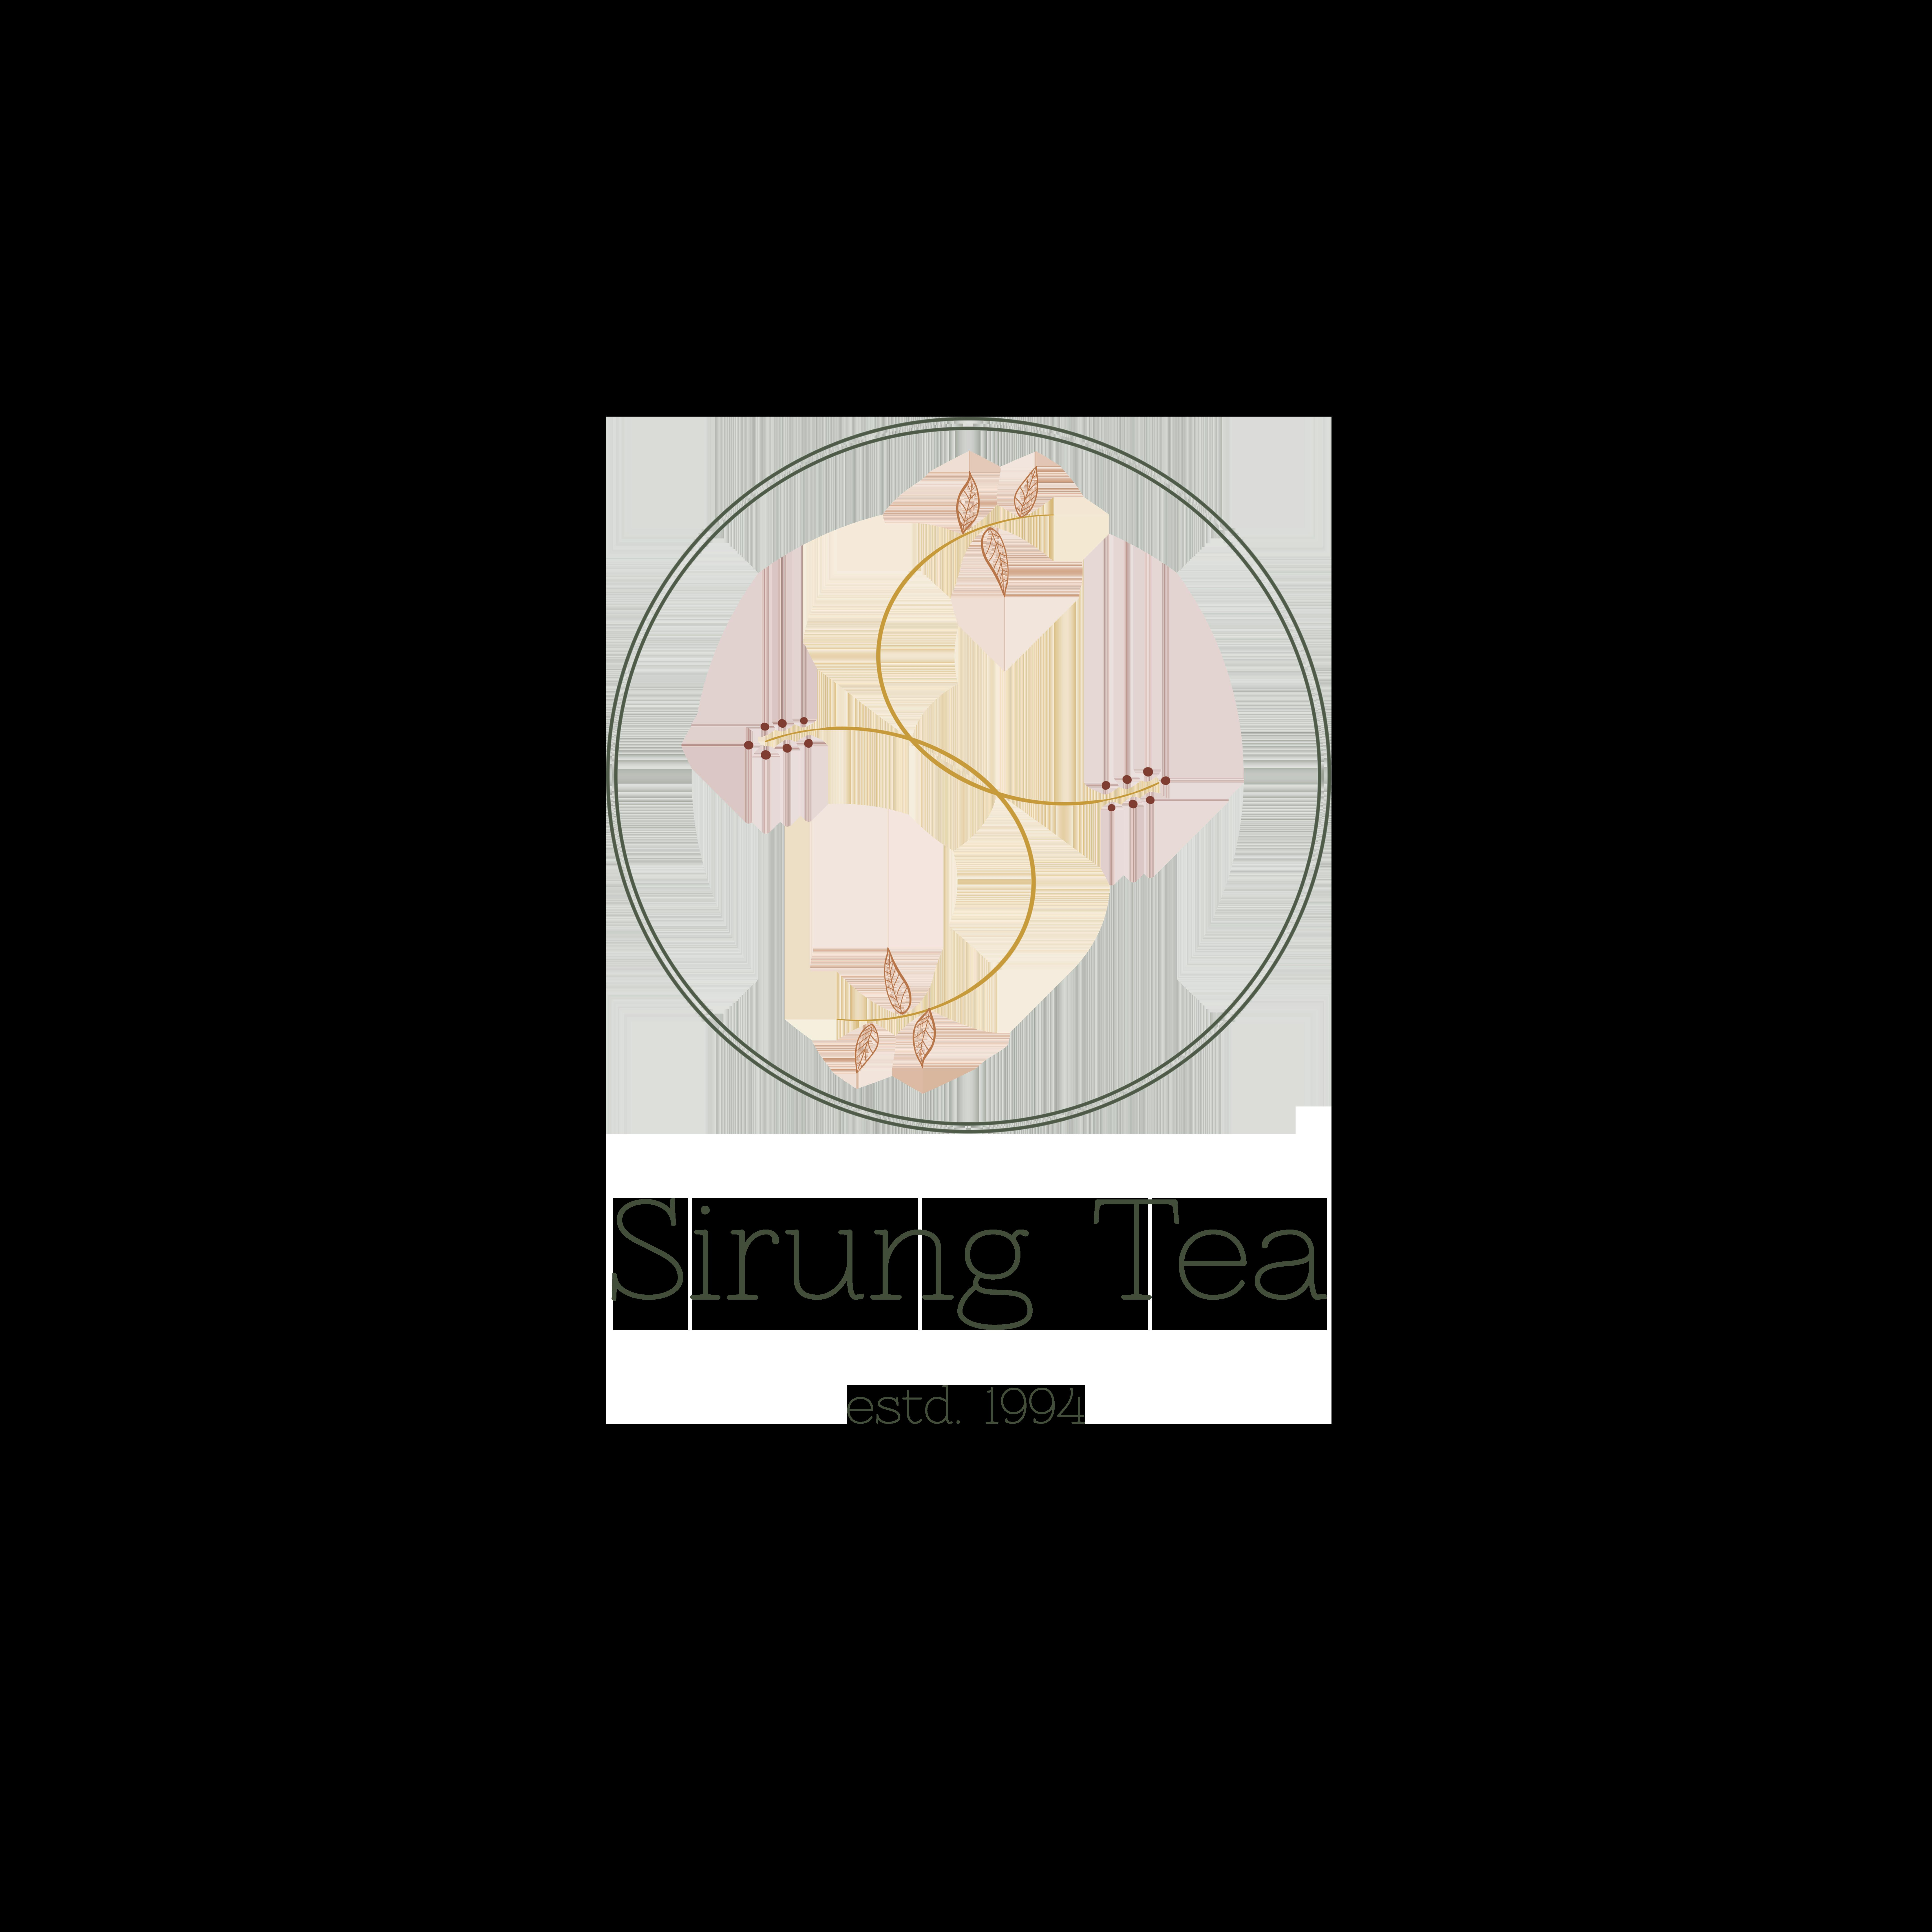 Sirung Tea Estate